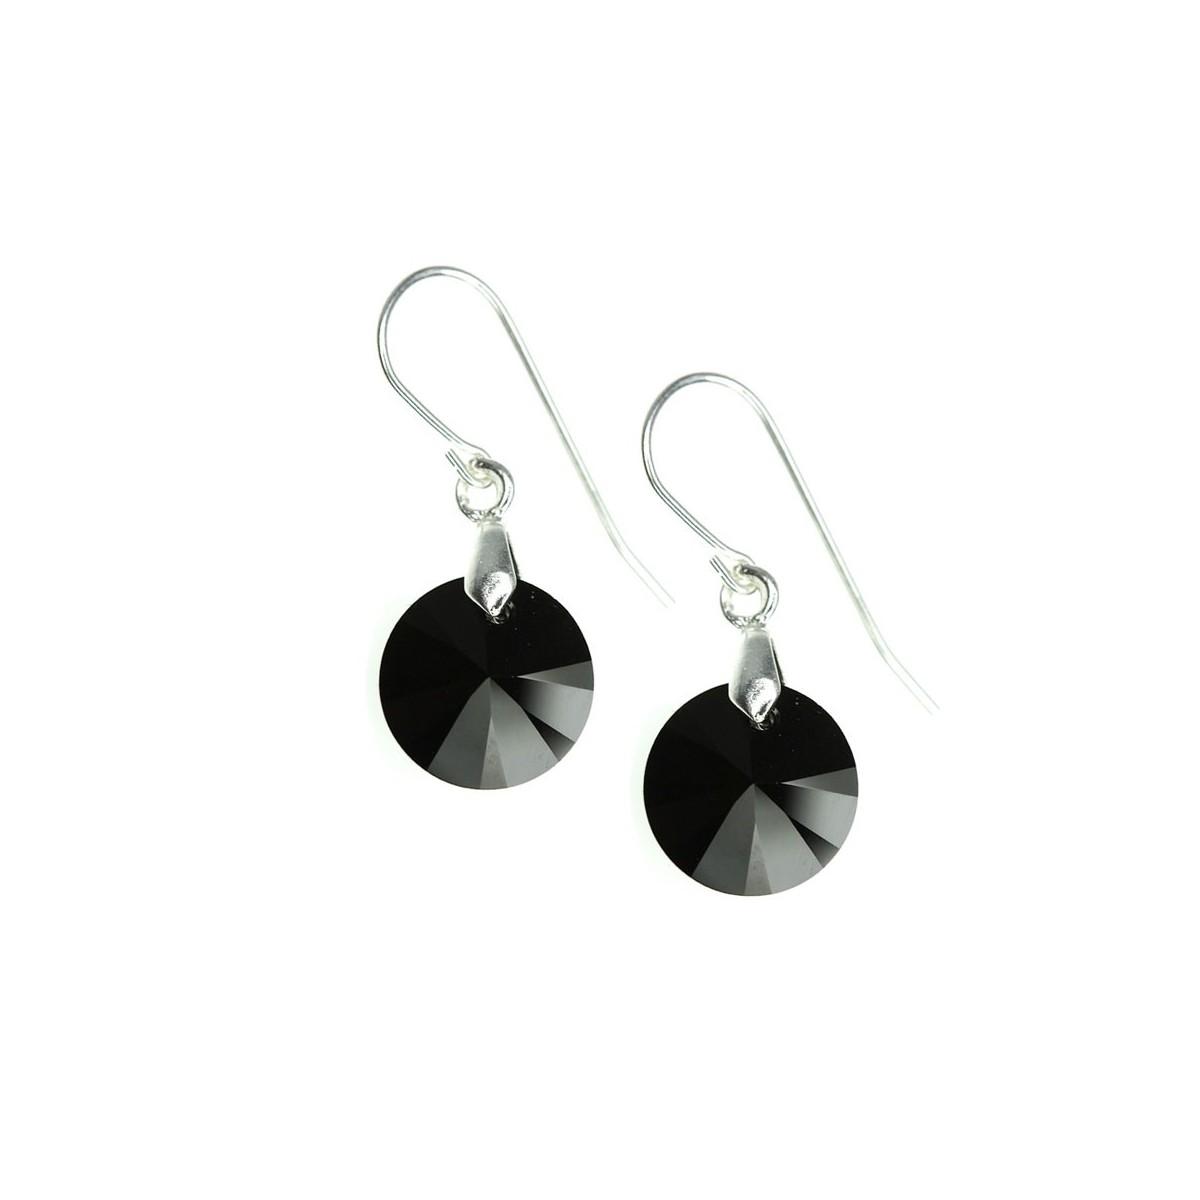 Boucles d'oreilles So Charm ornées d'un cristal noir made with crystal from Swarovski